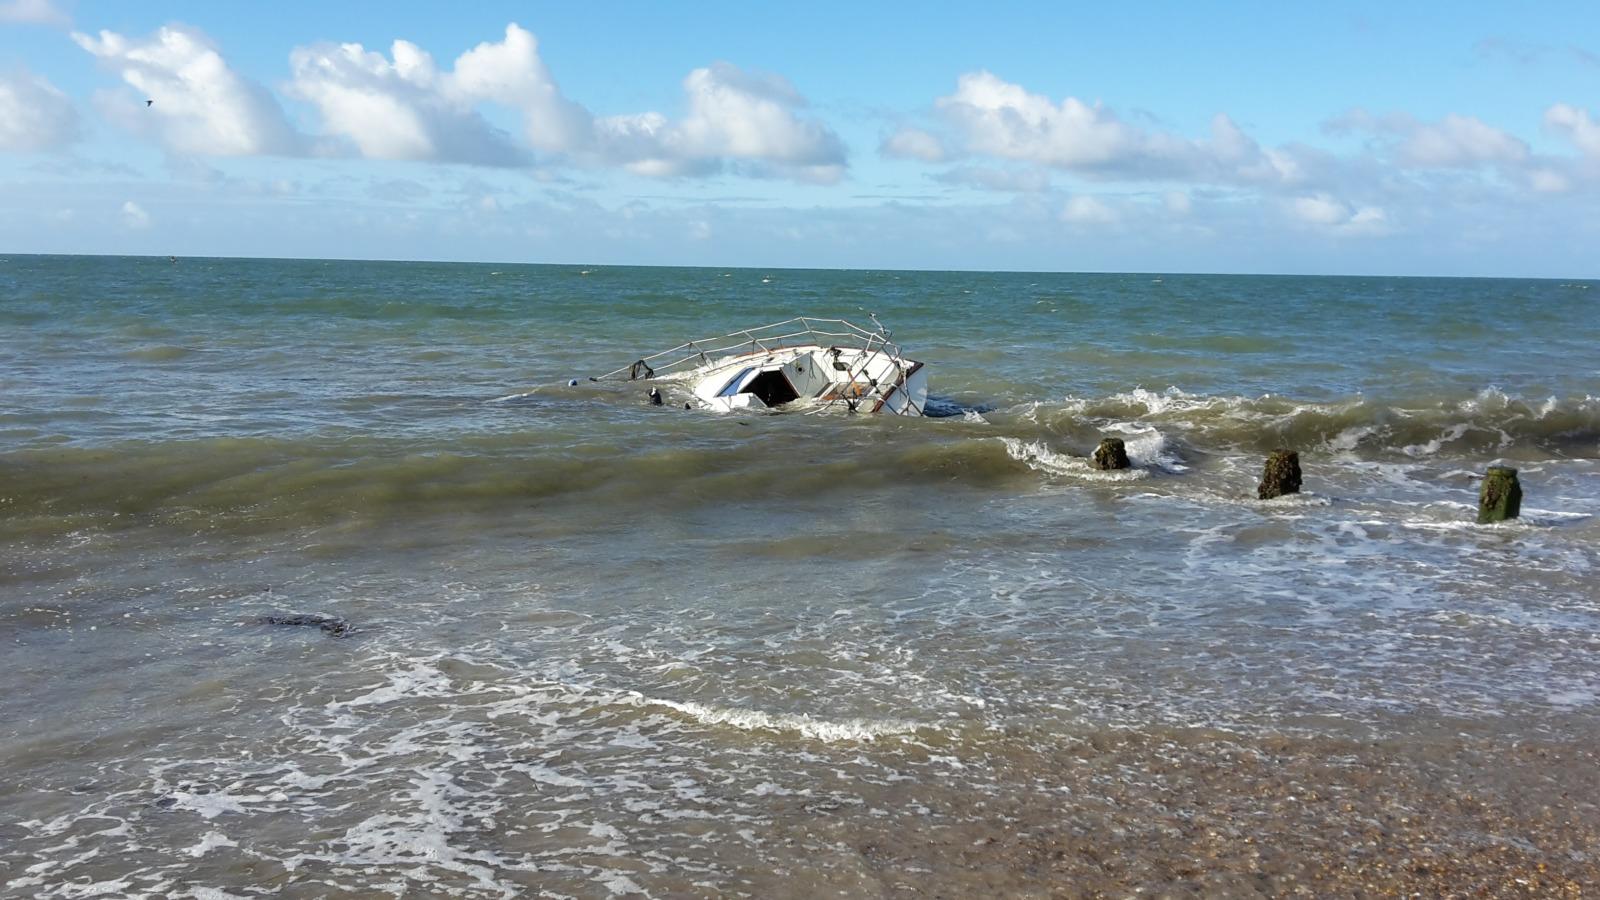 A yacht run aground